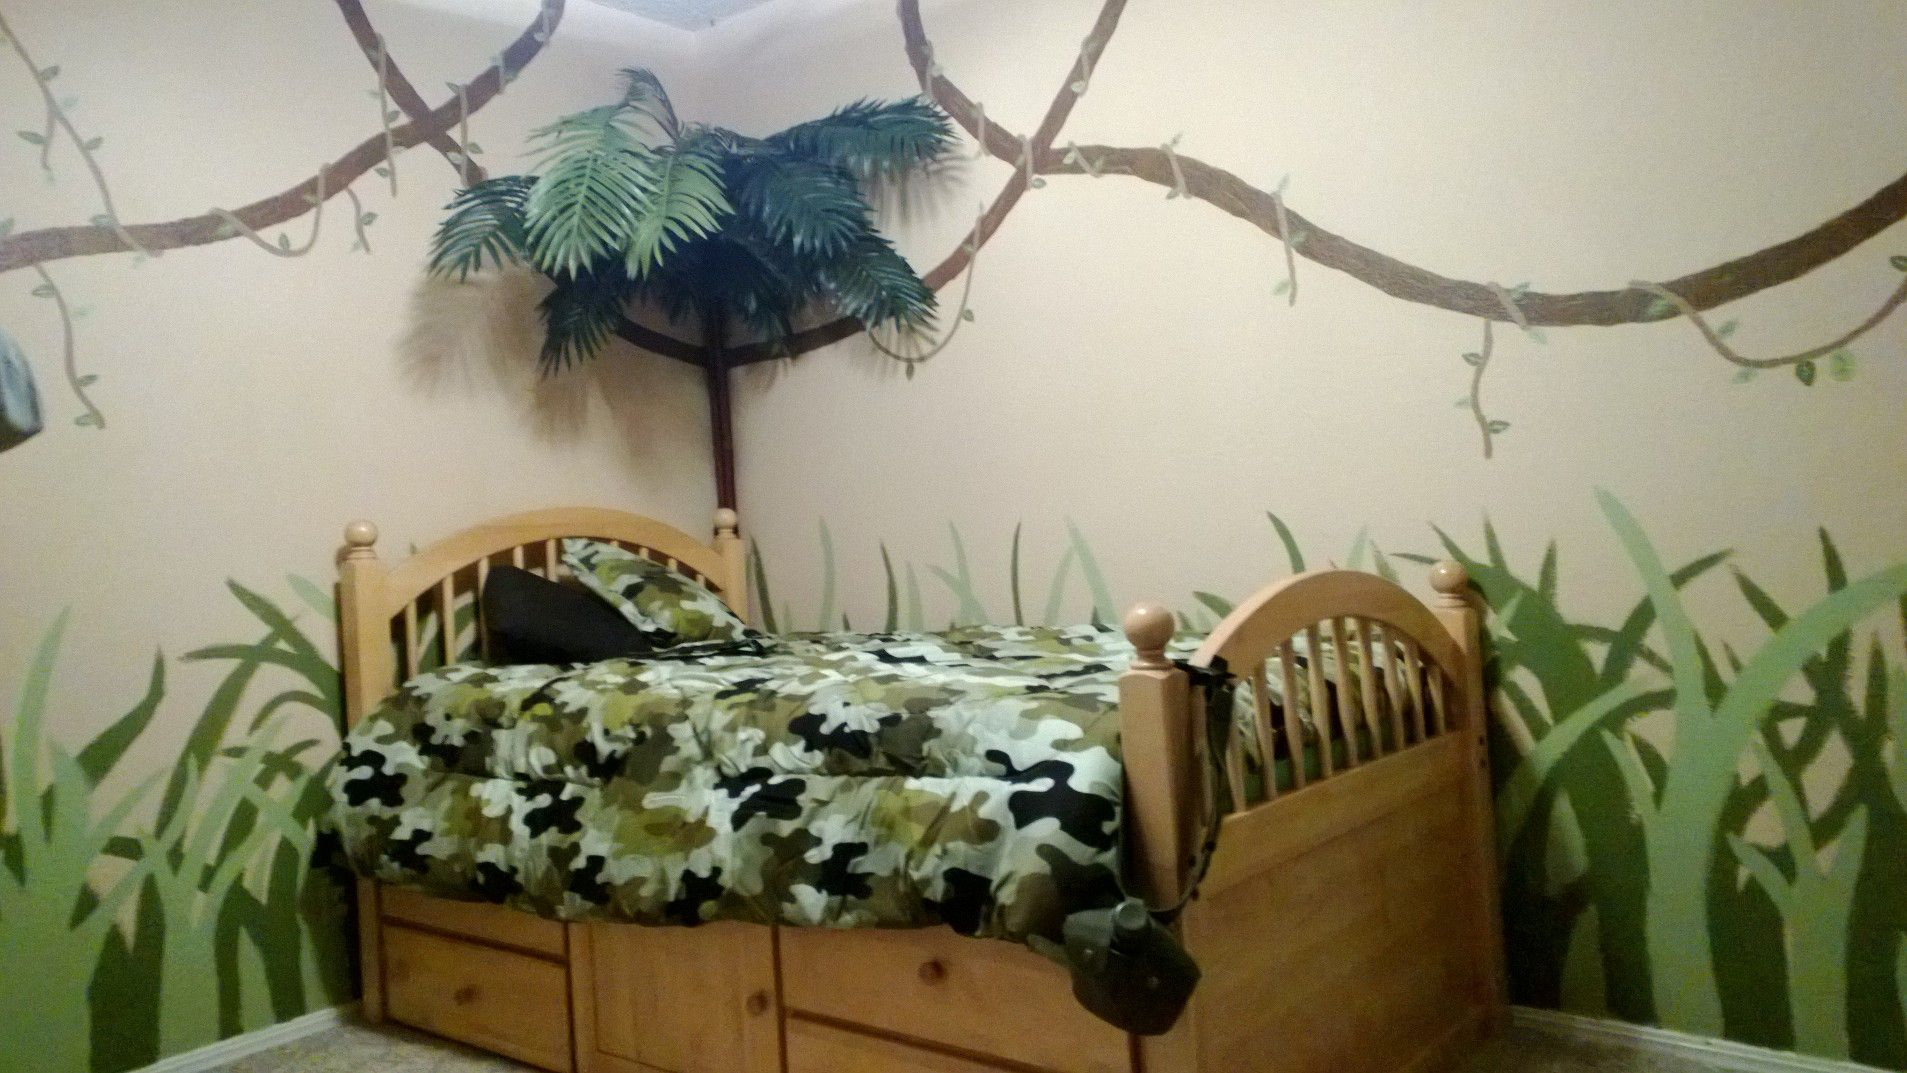 Camo boys room for kids pinterest for Camo bedroom ideas boys